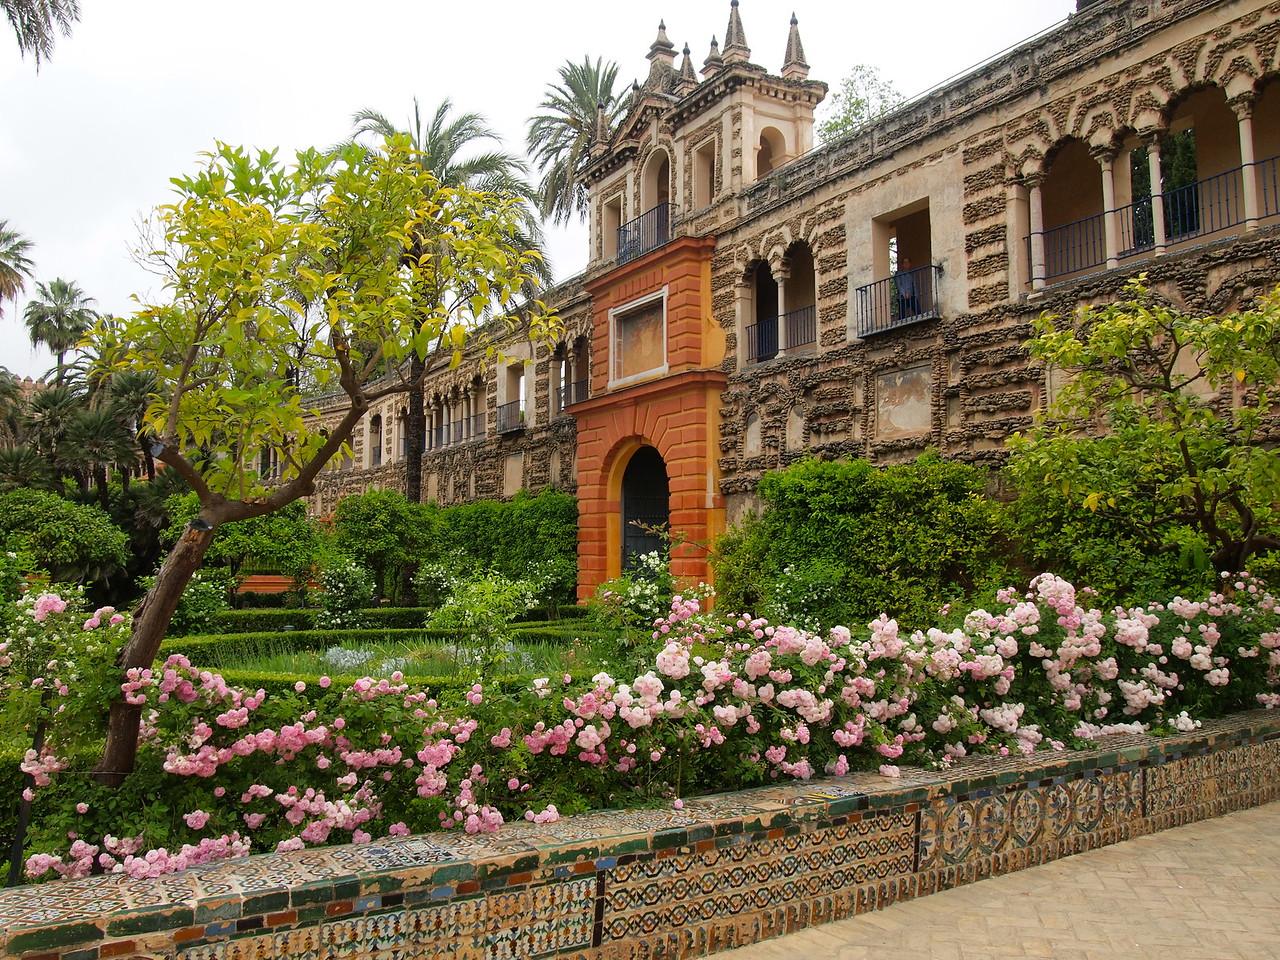 Gardens of the Royal Alcazar in Seville, Spain